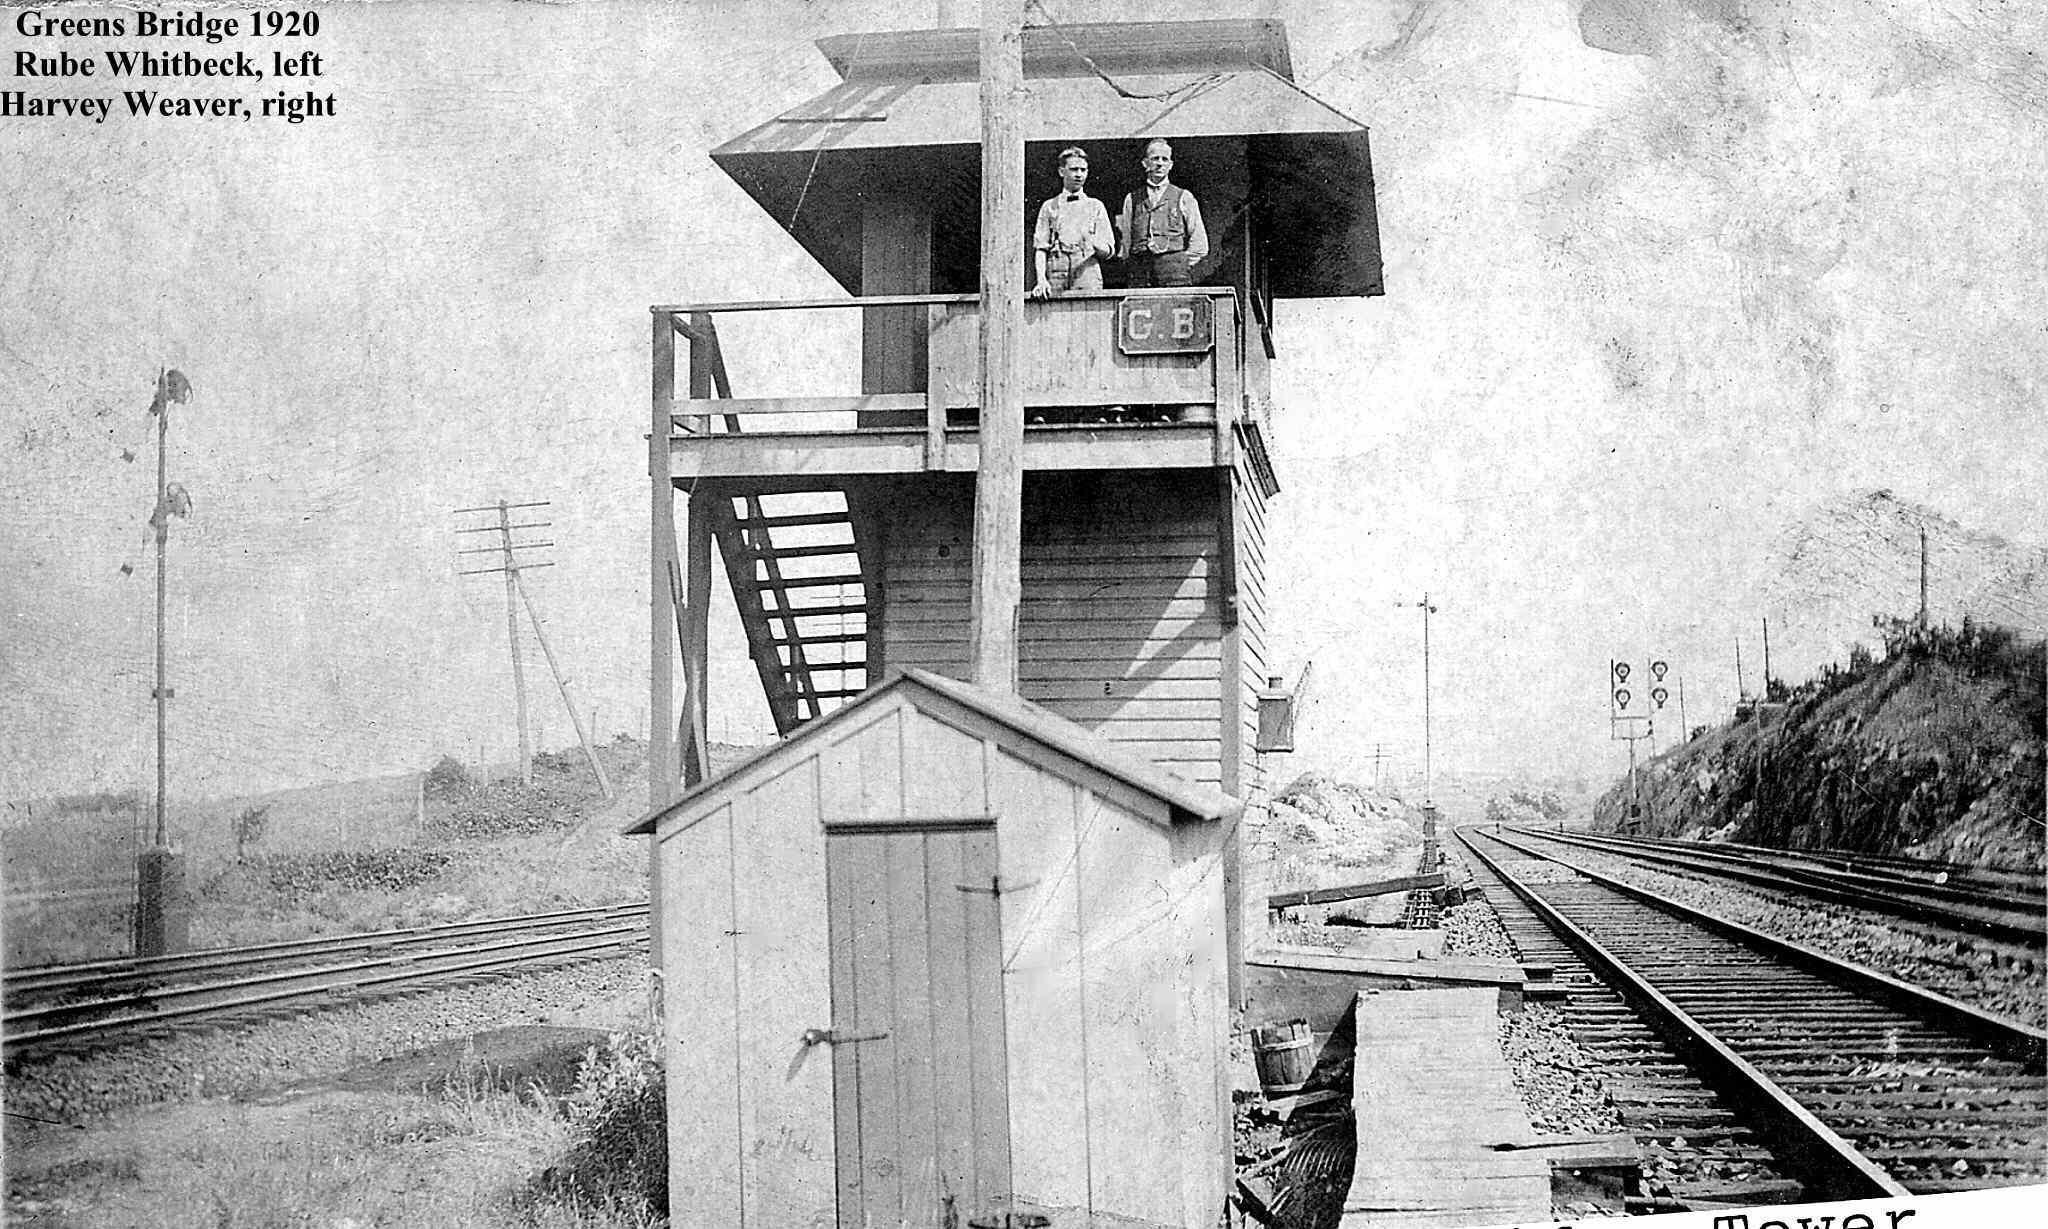 Green Bridge Tower. Phillipsburg, N.J. 1920